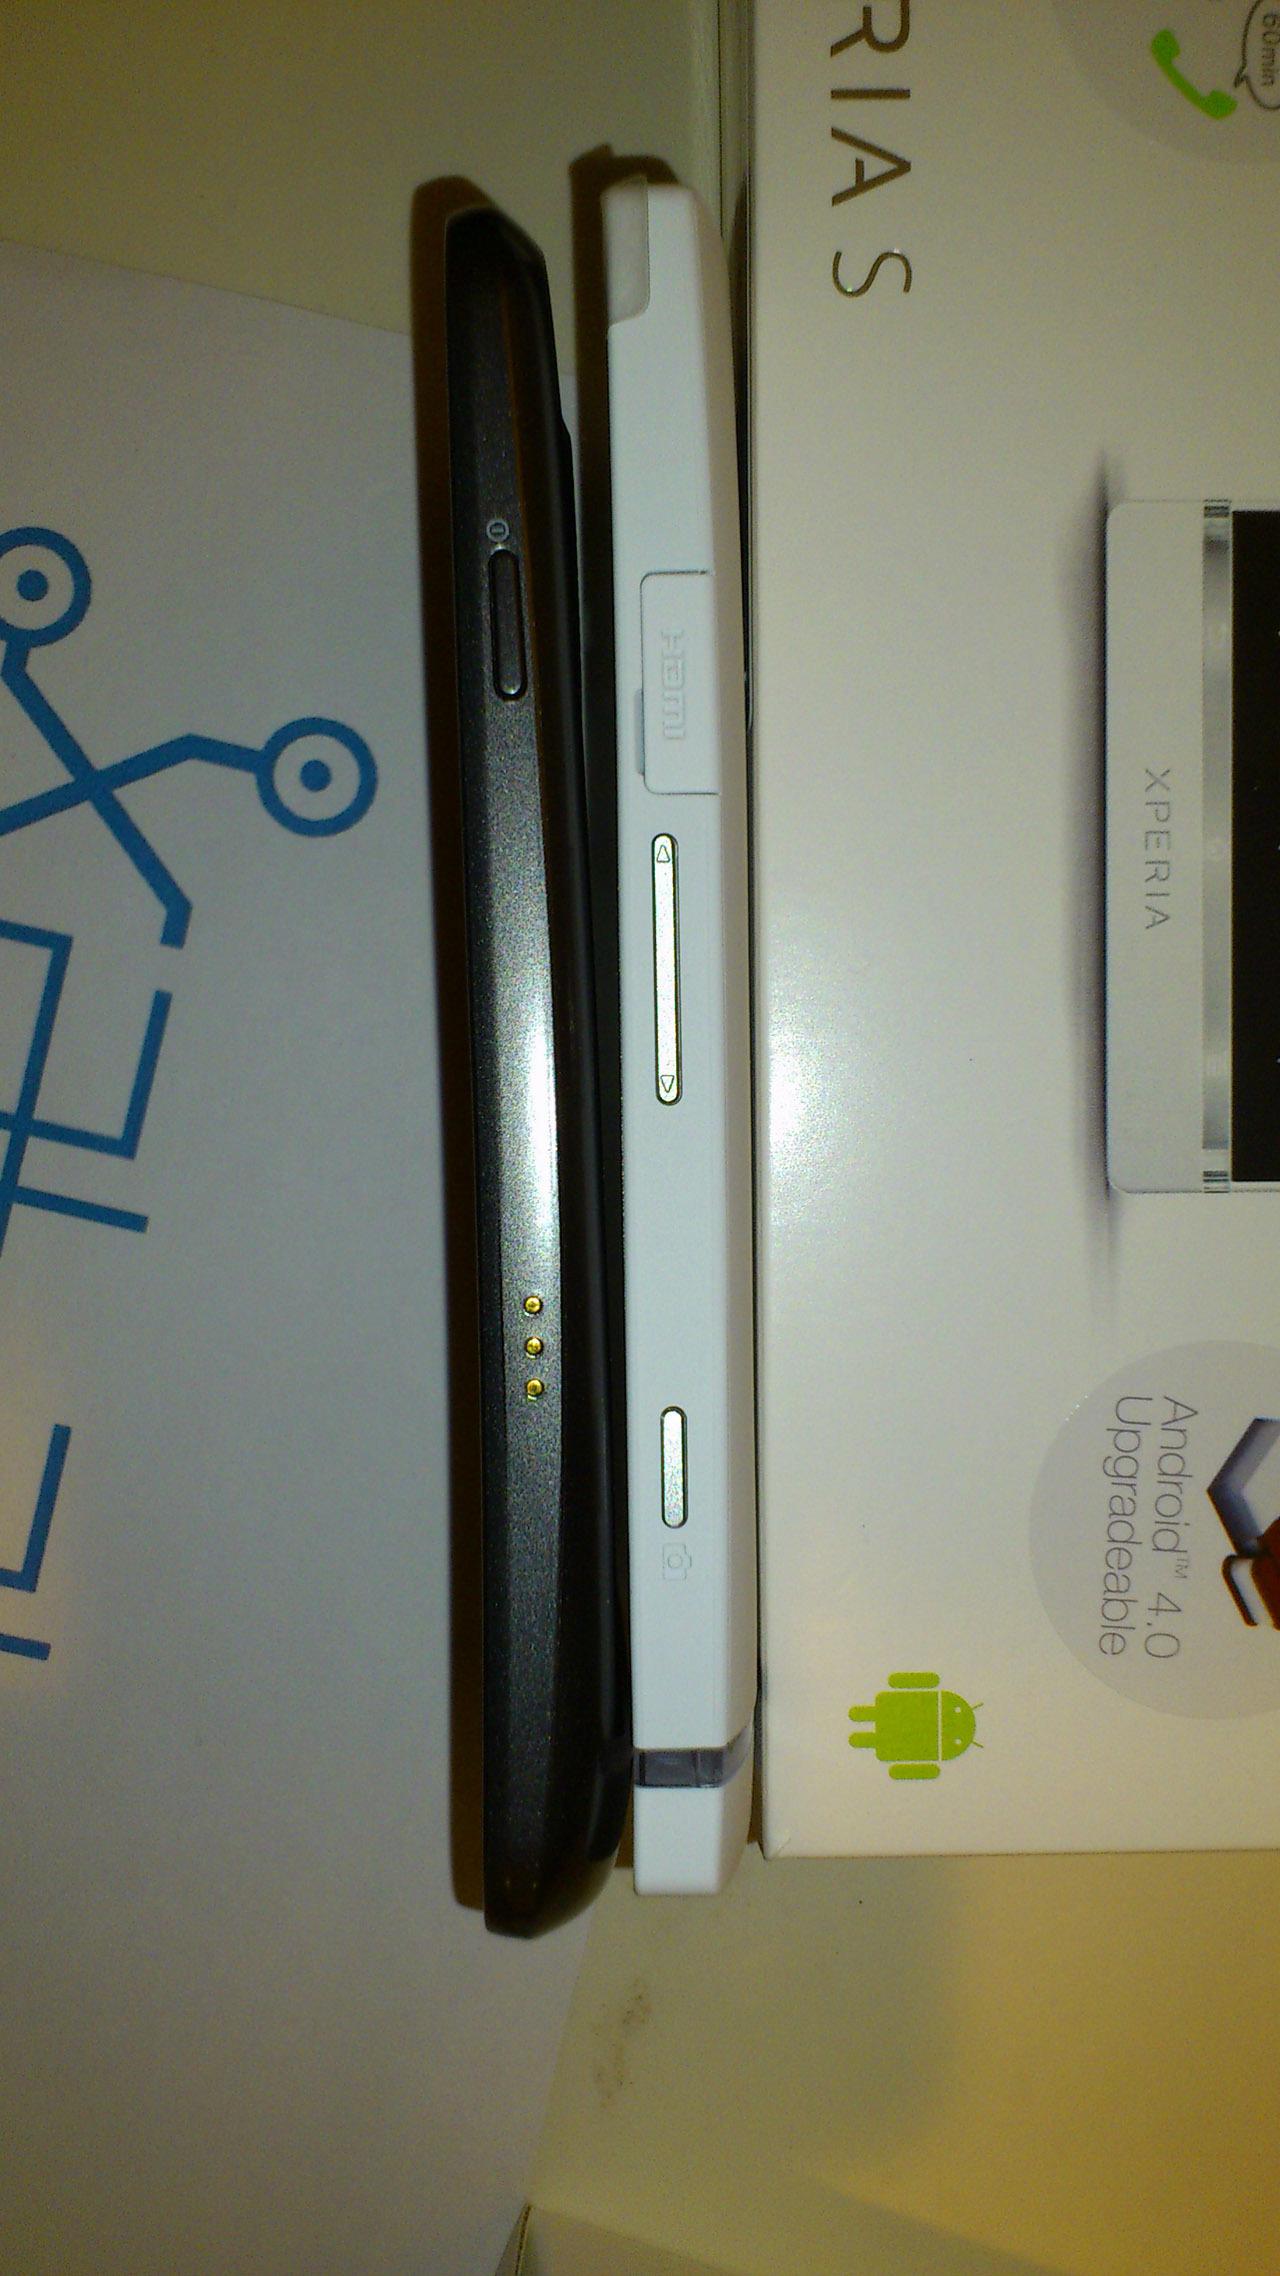 Foto de Sony Xperia S, análisis a fondo (48/50)